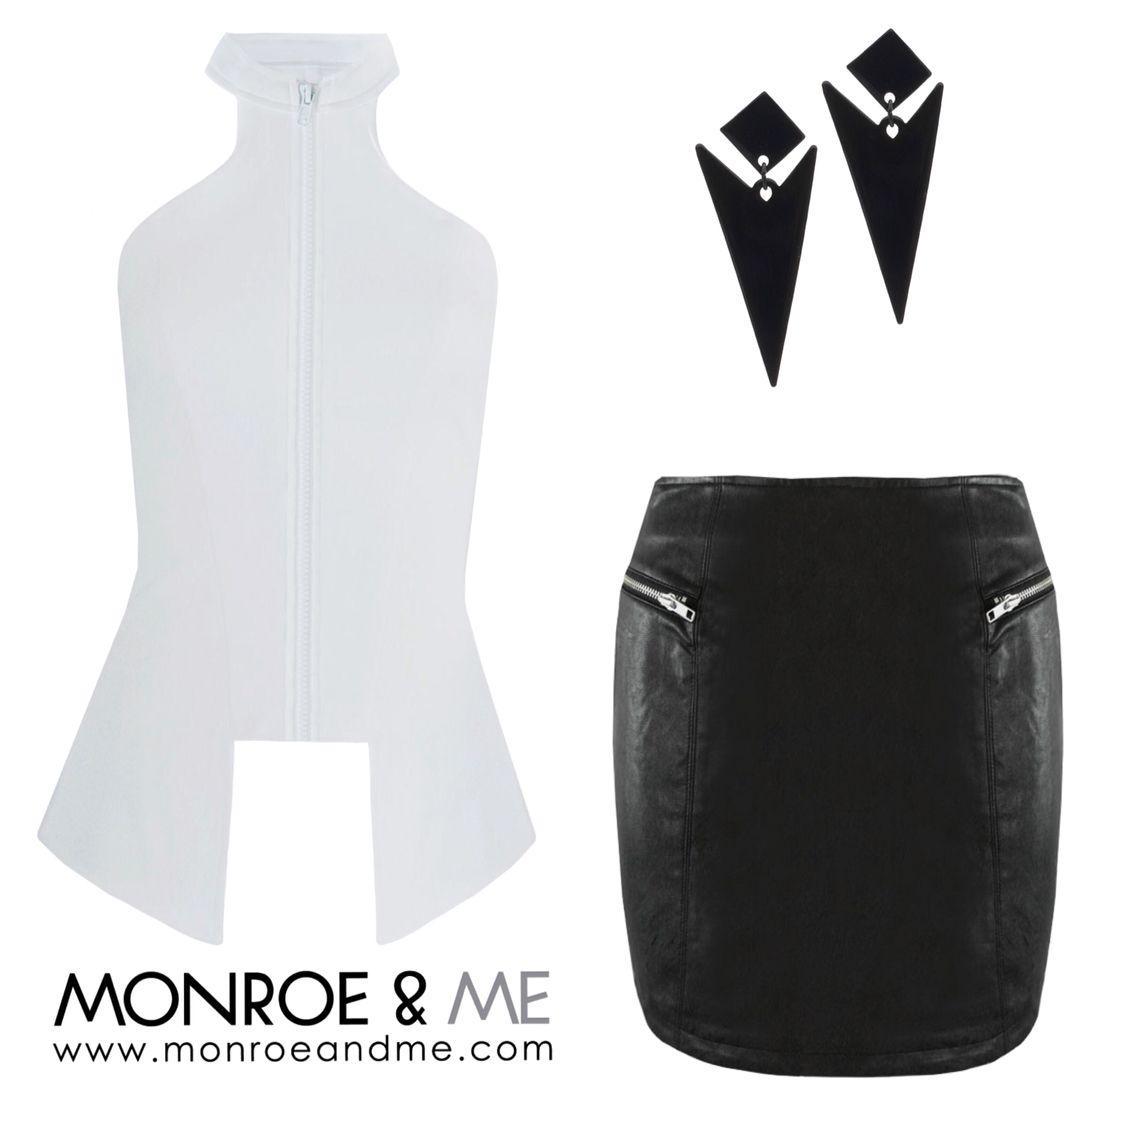 Work this outfit! #monochrome #structured #auguststreet #eviltwin #ootd #makeastatement #bold #nali #blackandwhite #utility #fashion #style #trend #monroeandme #dubai #mydubai #abudhabi #uae #lebanon #qatar #bahrain #oman #saudiarabia #kuwait #jordan #egypt #cyprus #ladiesnight #brunch